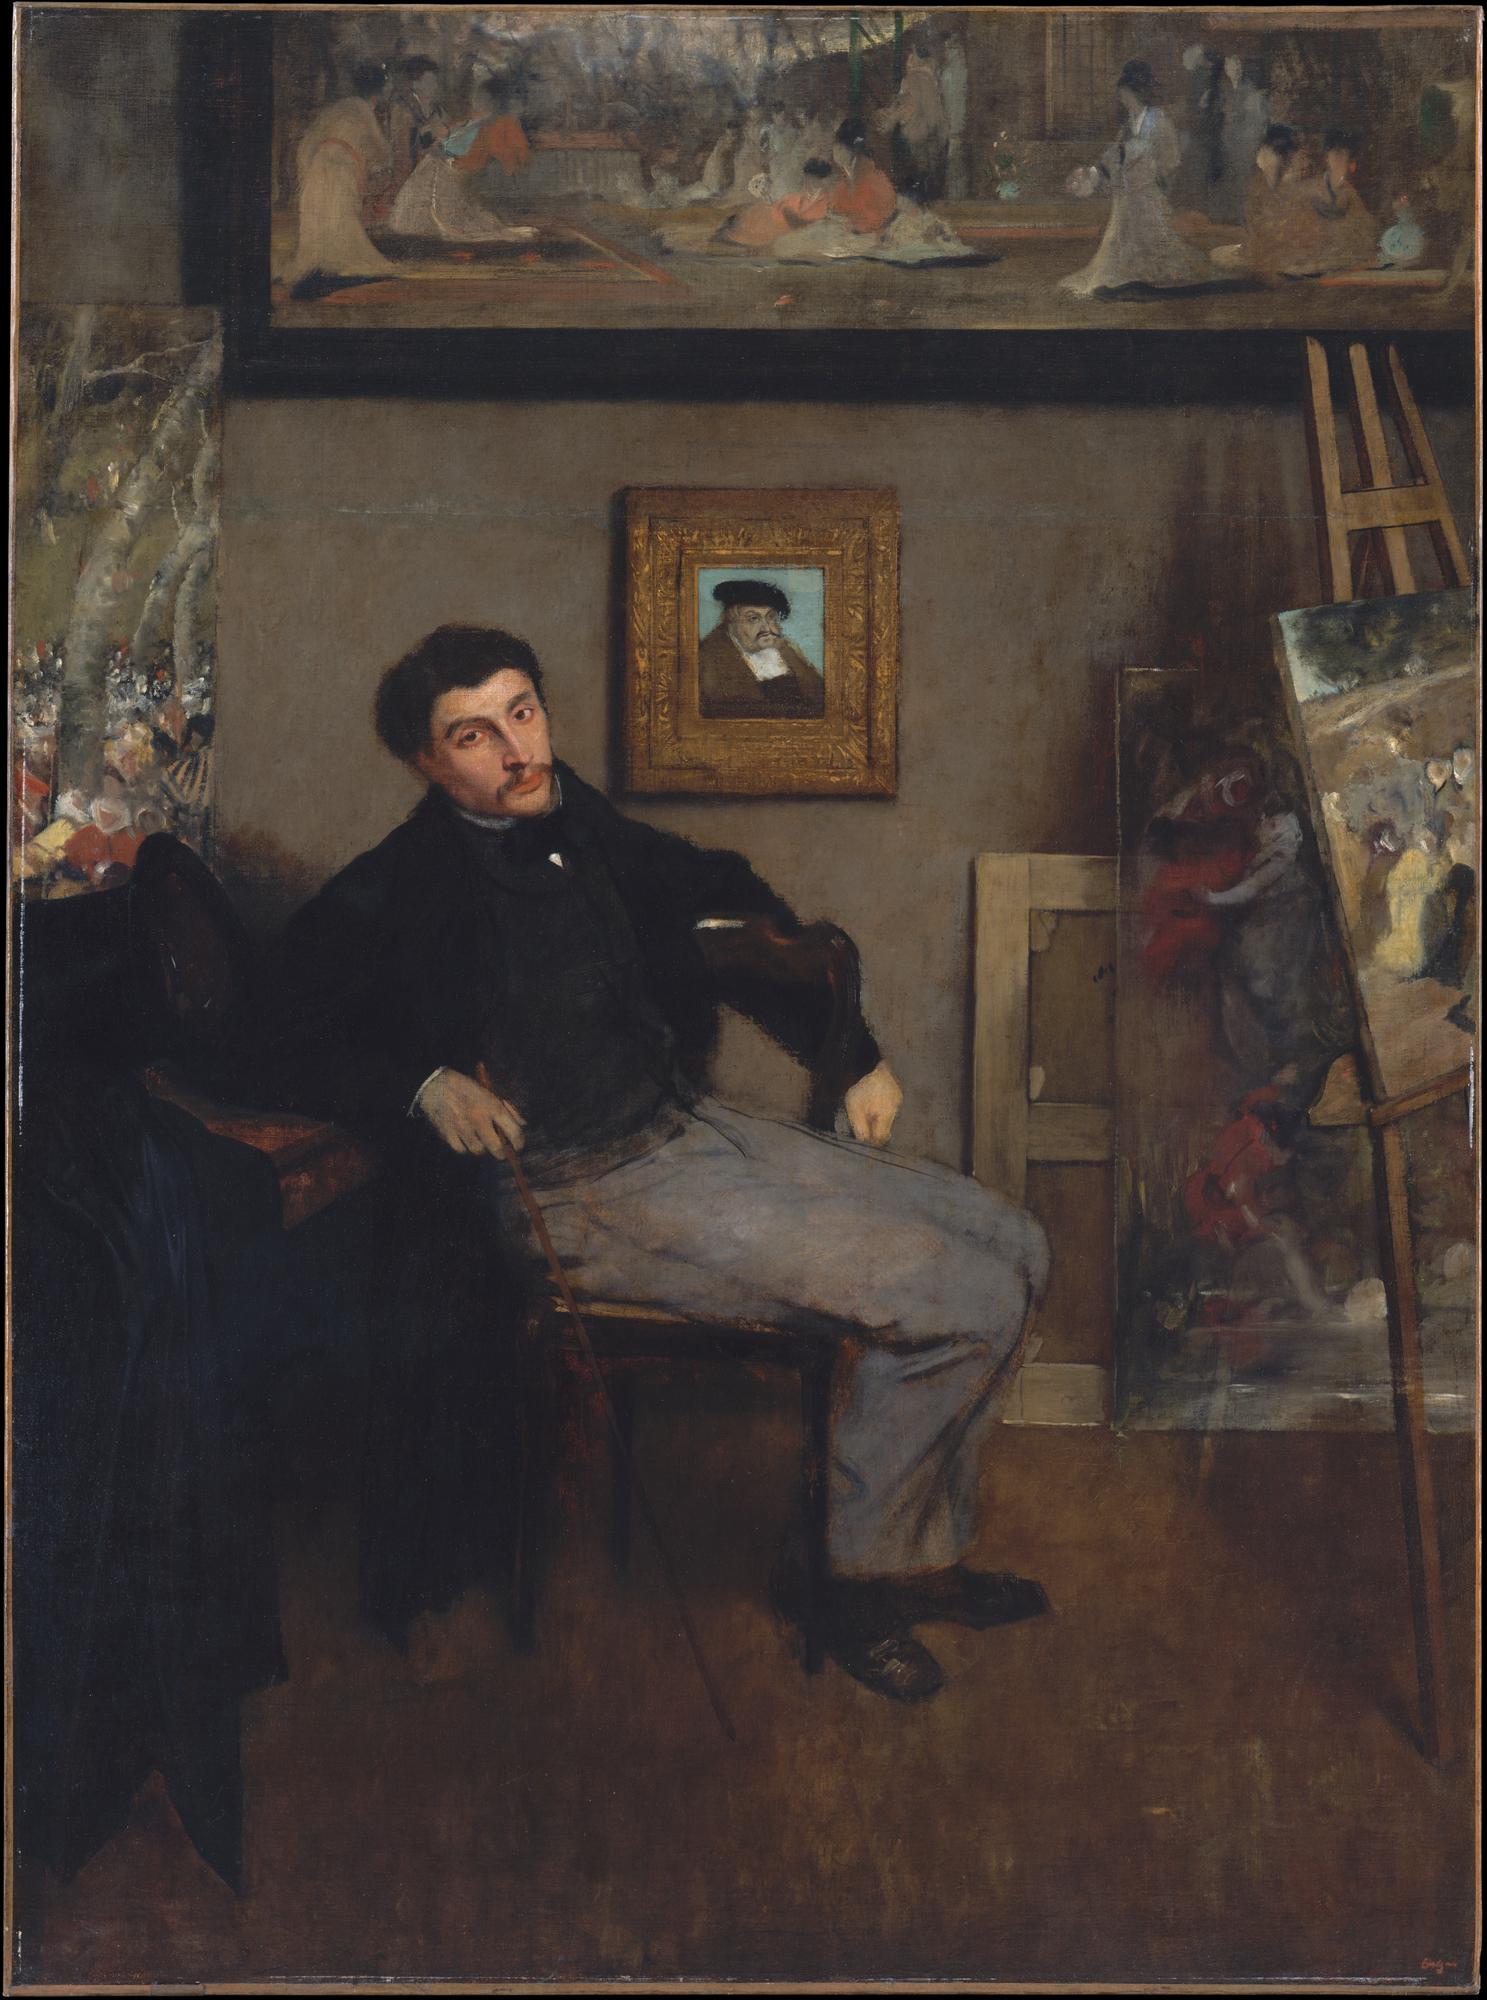 Portrait of James Tissot